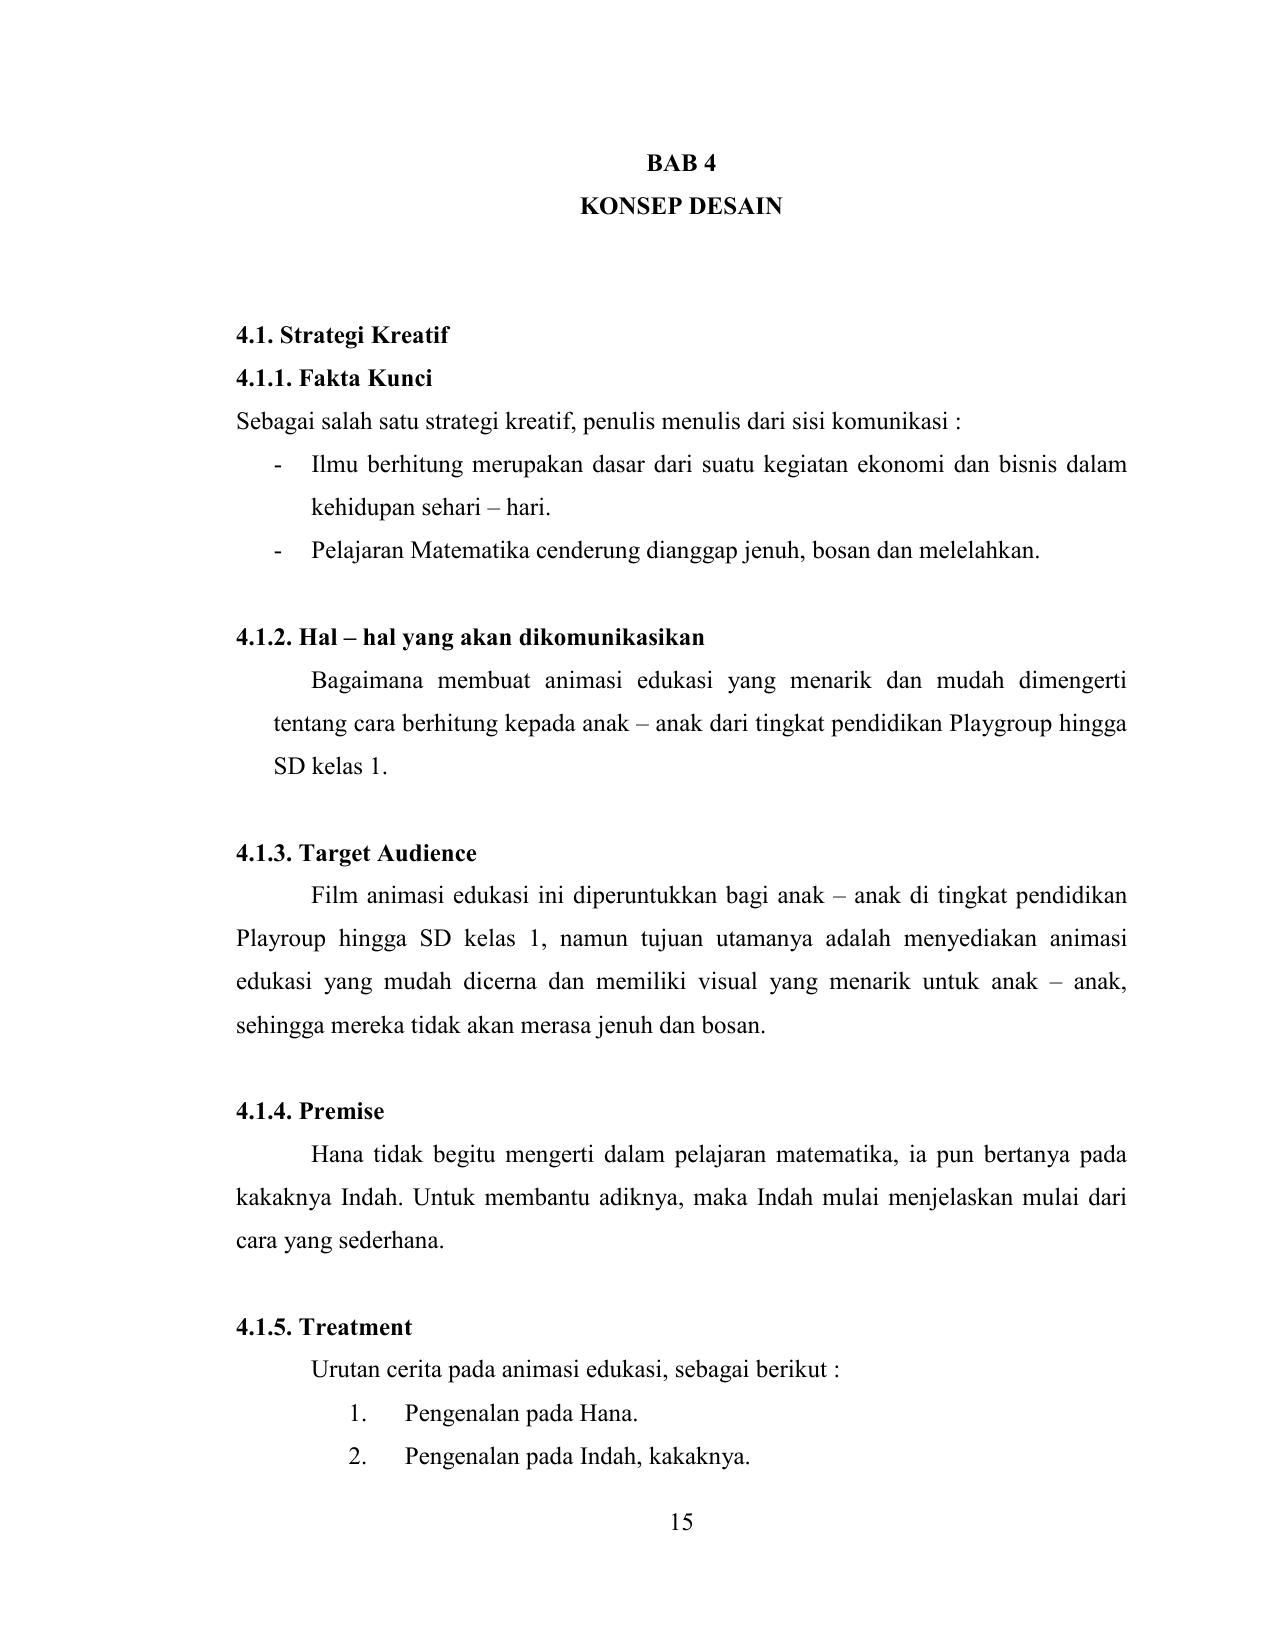 Strategi Kreatif 4 1 1 Fakta Kunci